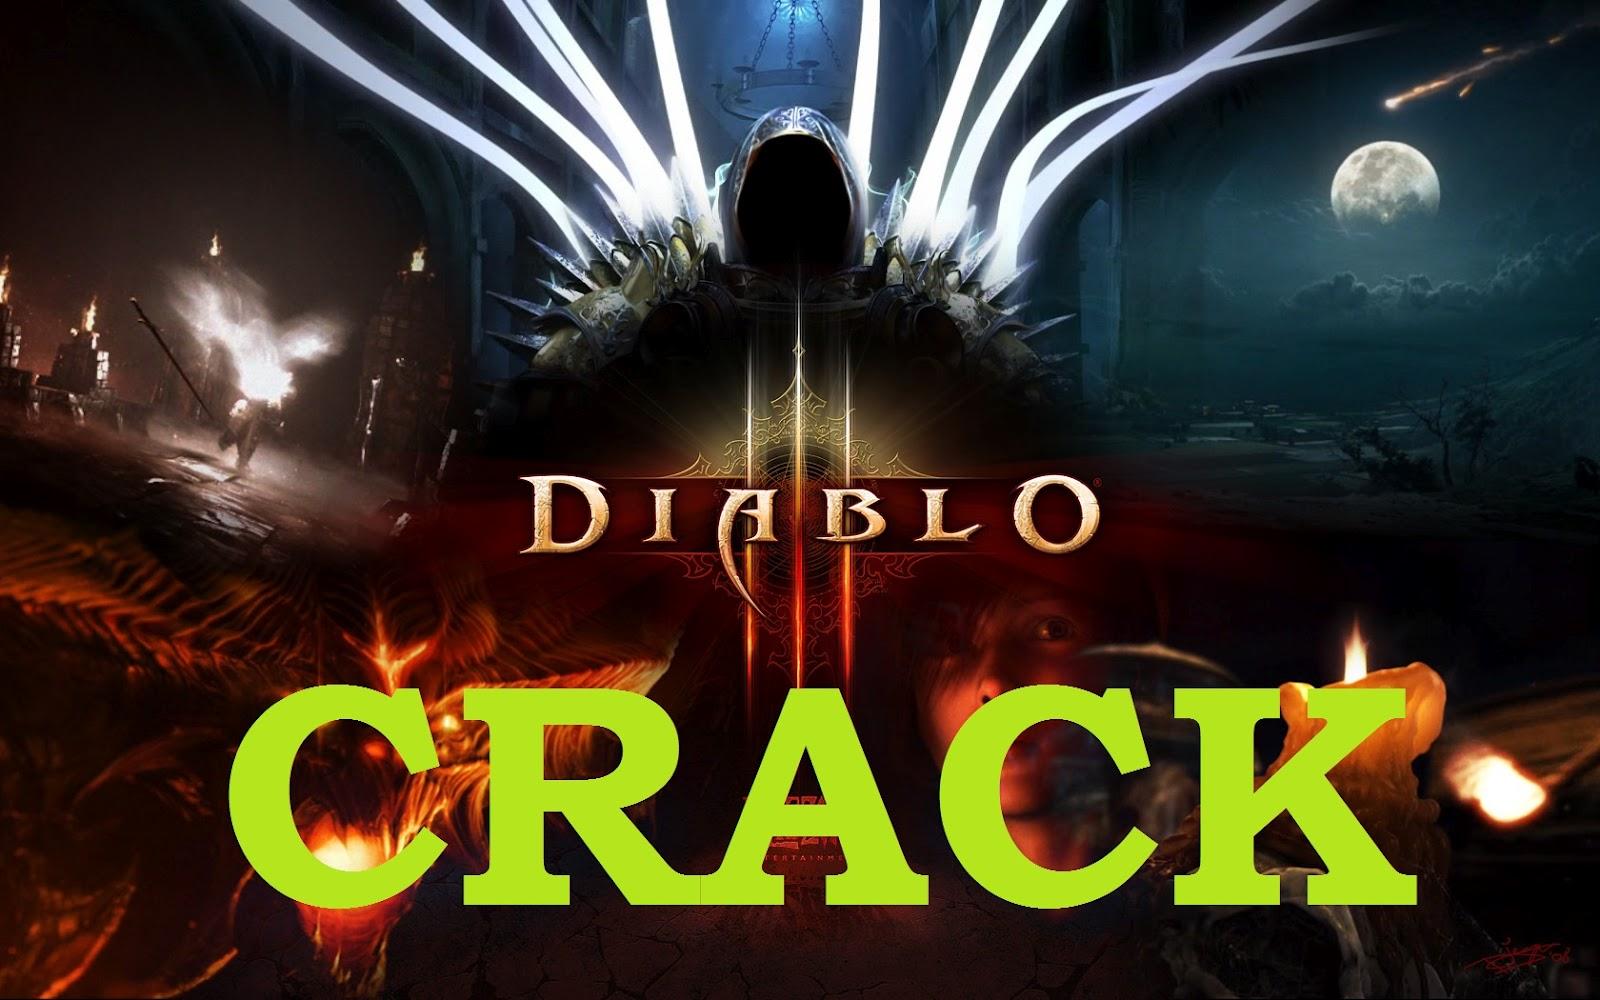 Diablo 3 Crack ~ Cracks and Games FREE